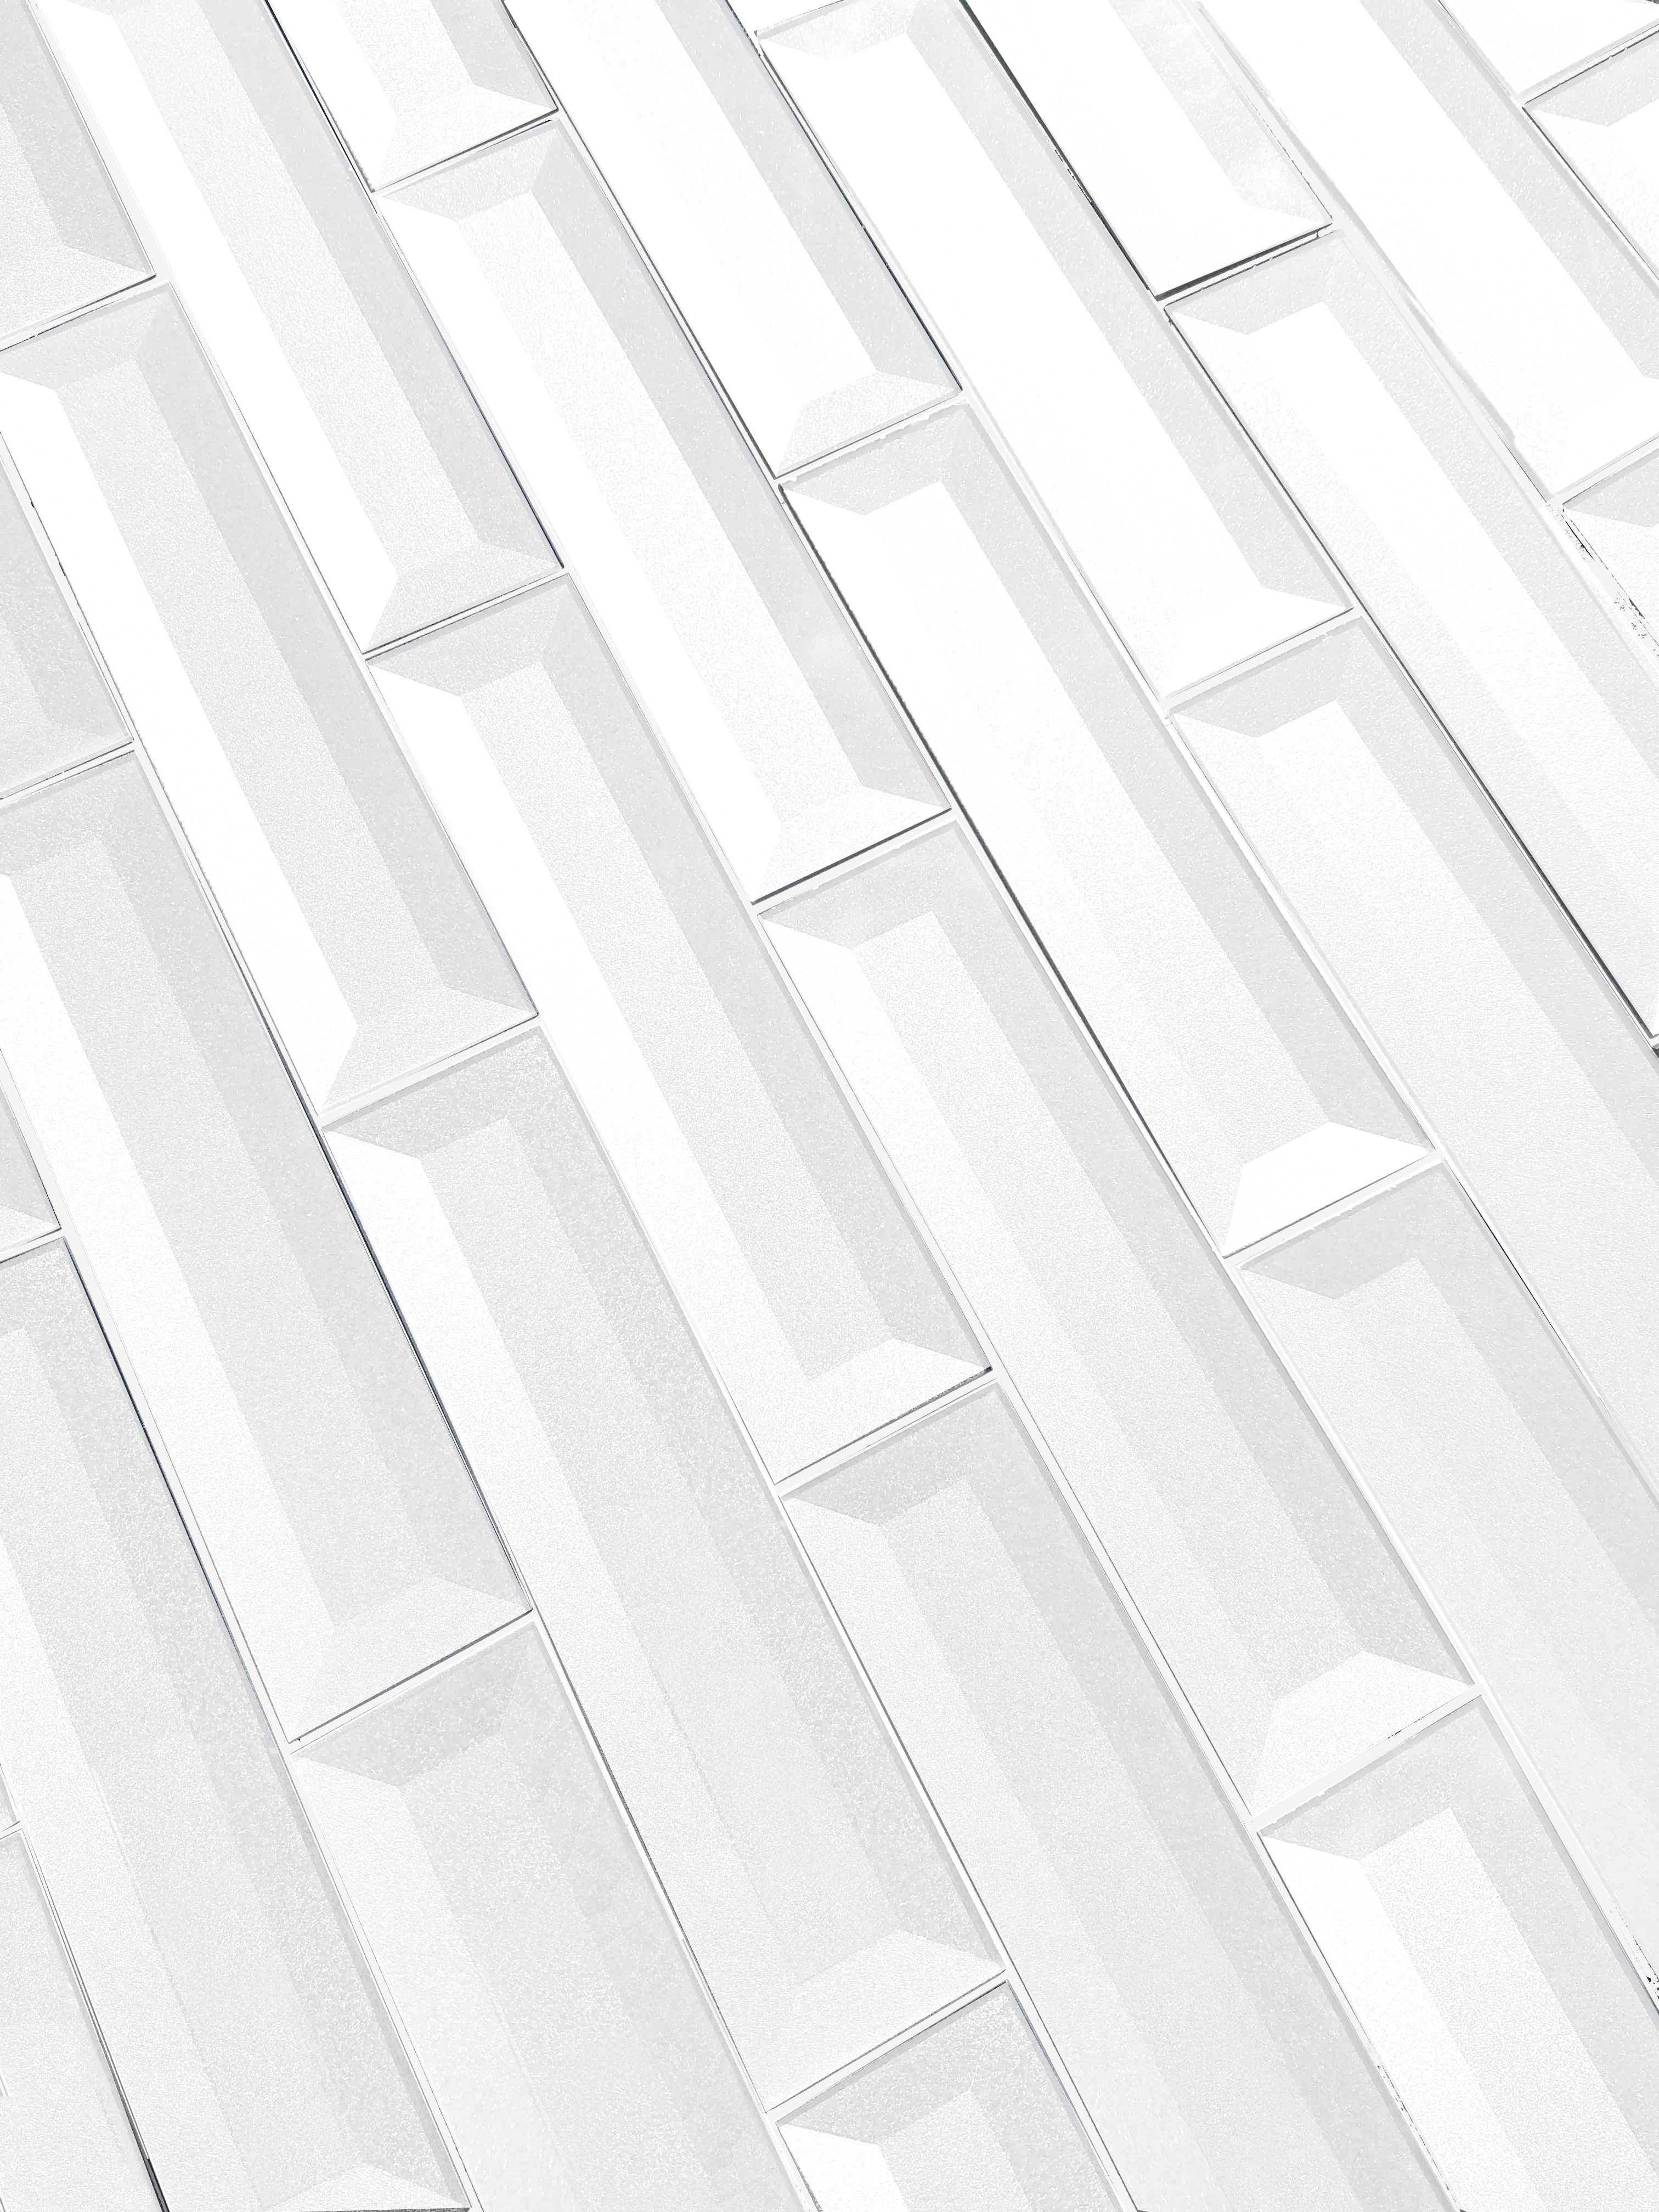 "Forever 2"" x 8"" Beveled White Glass Loose Backsplash Wall Tile"